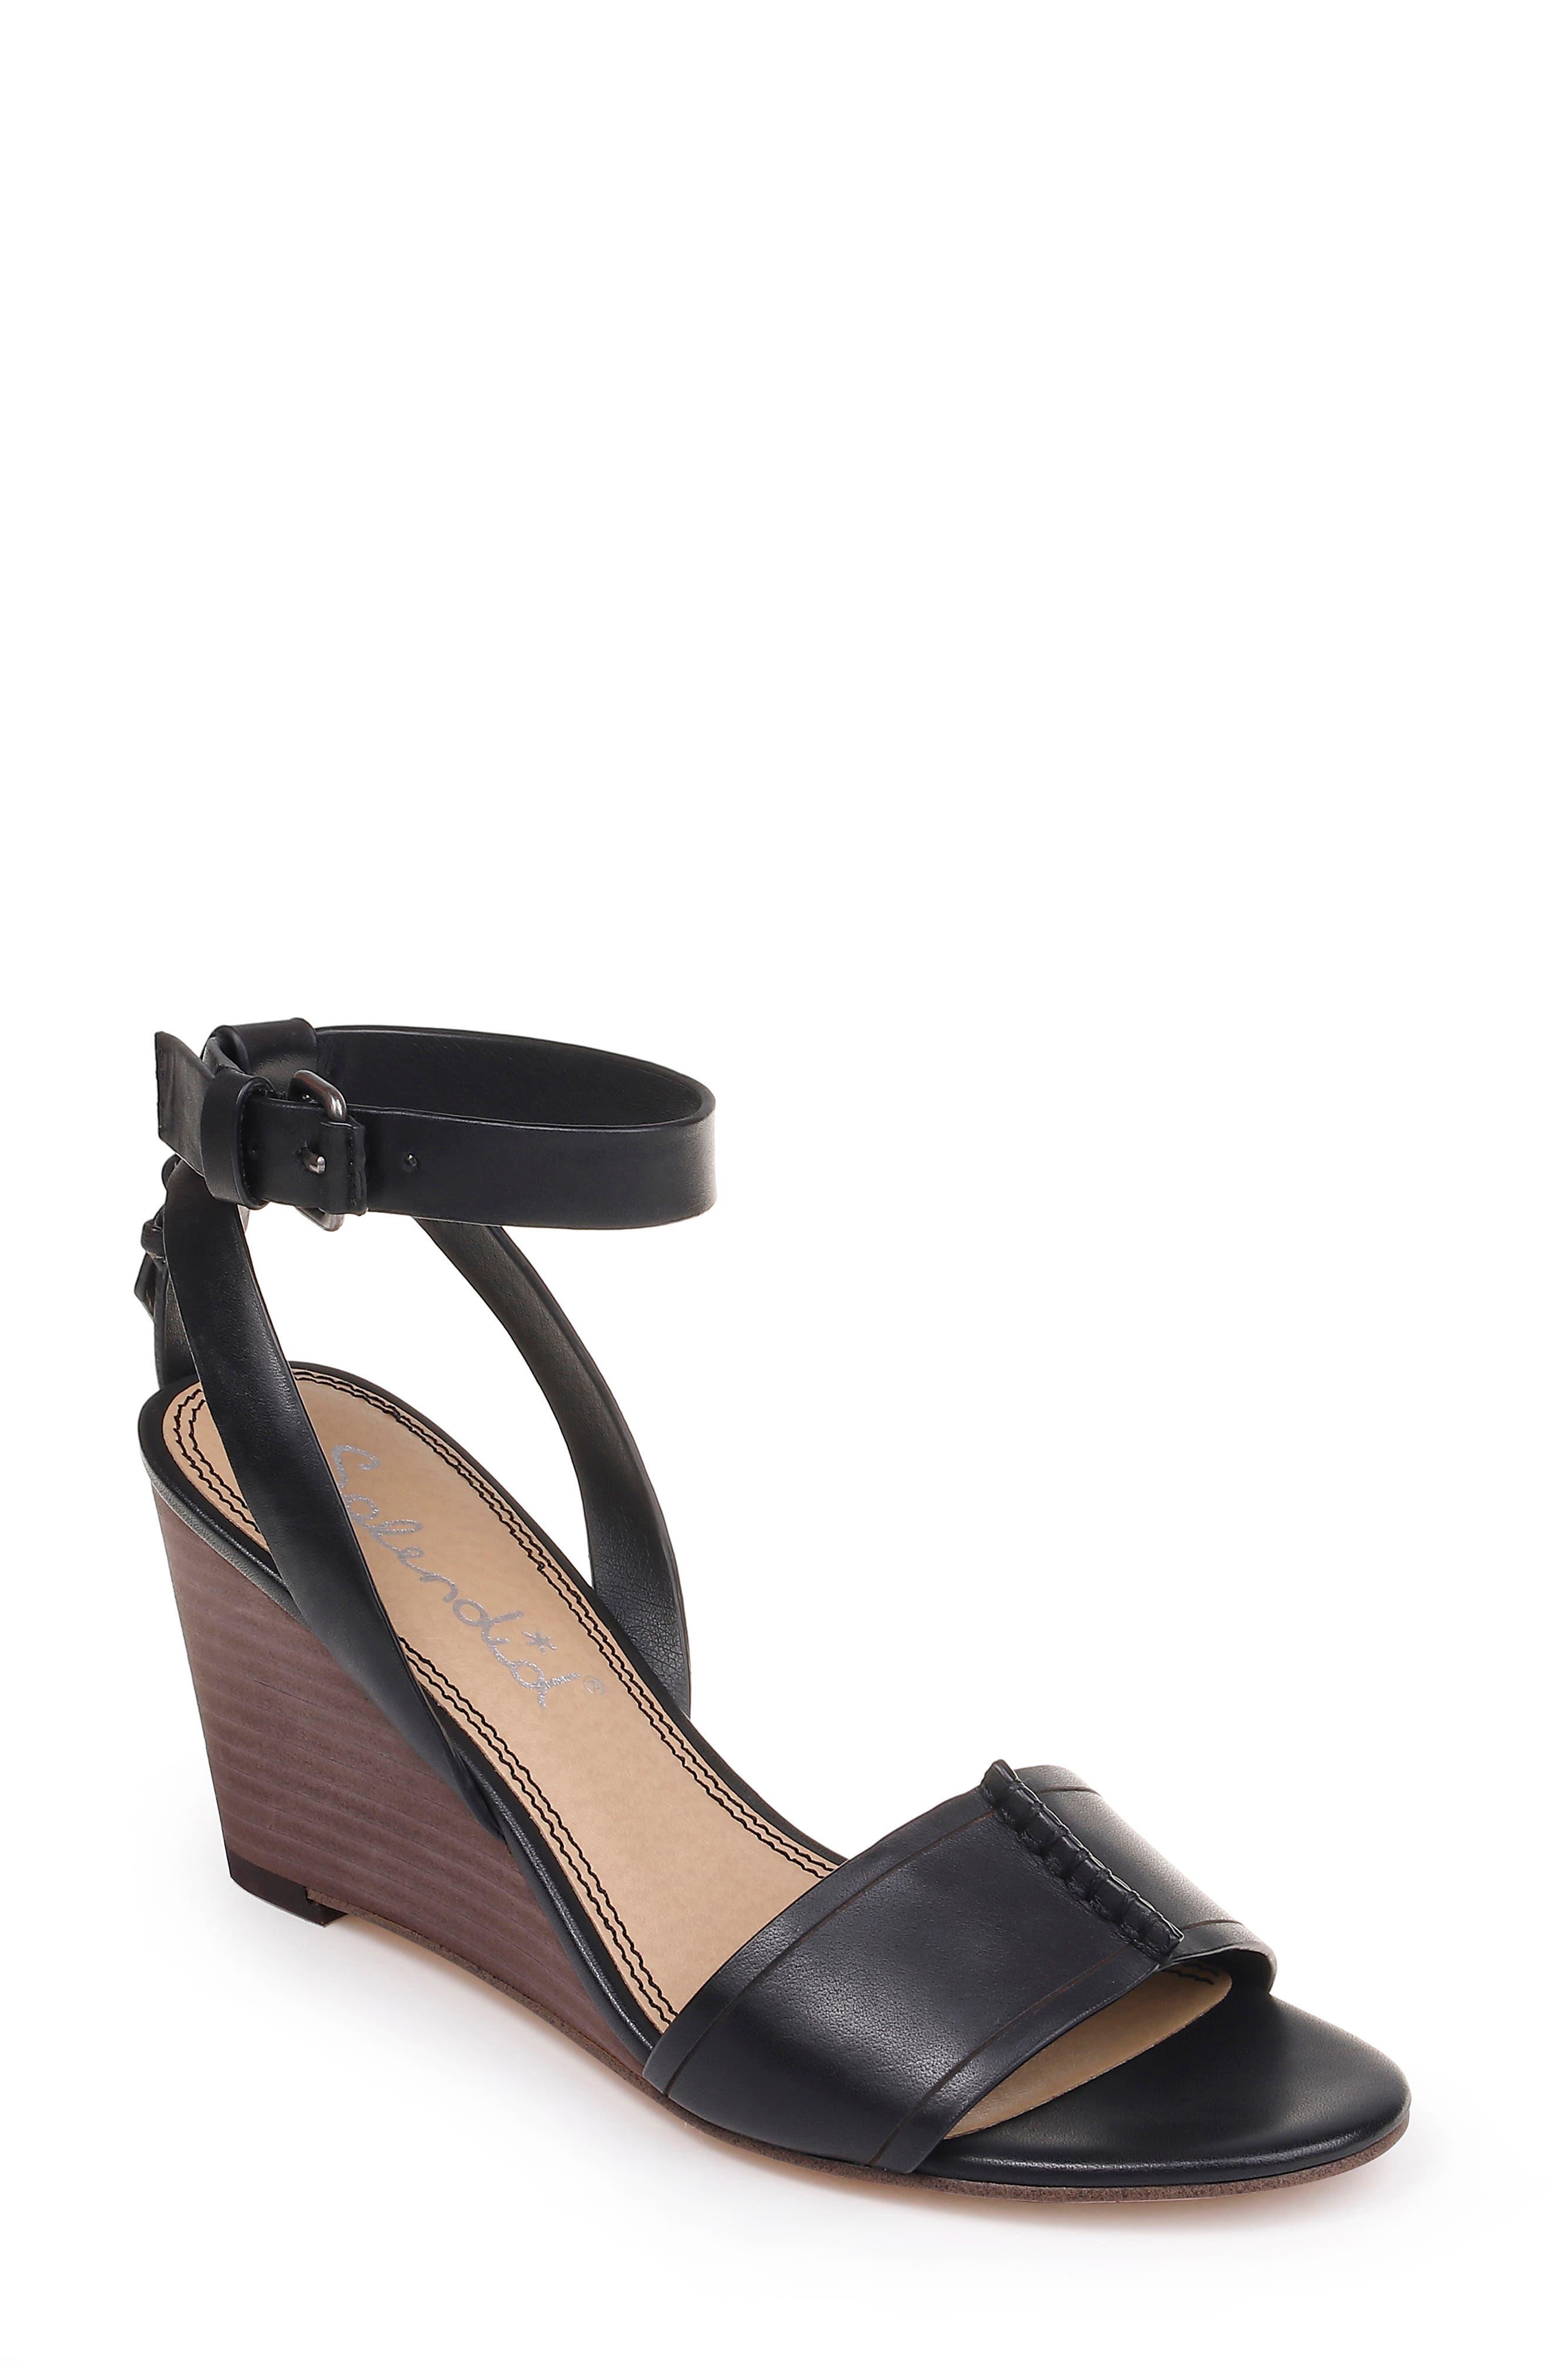 SPLENDID, Tadeo Wedge Ankle Strap Sandal, Main thumbnail 1, color, BLACK LEATHER